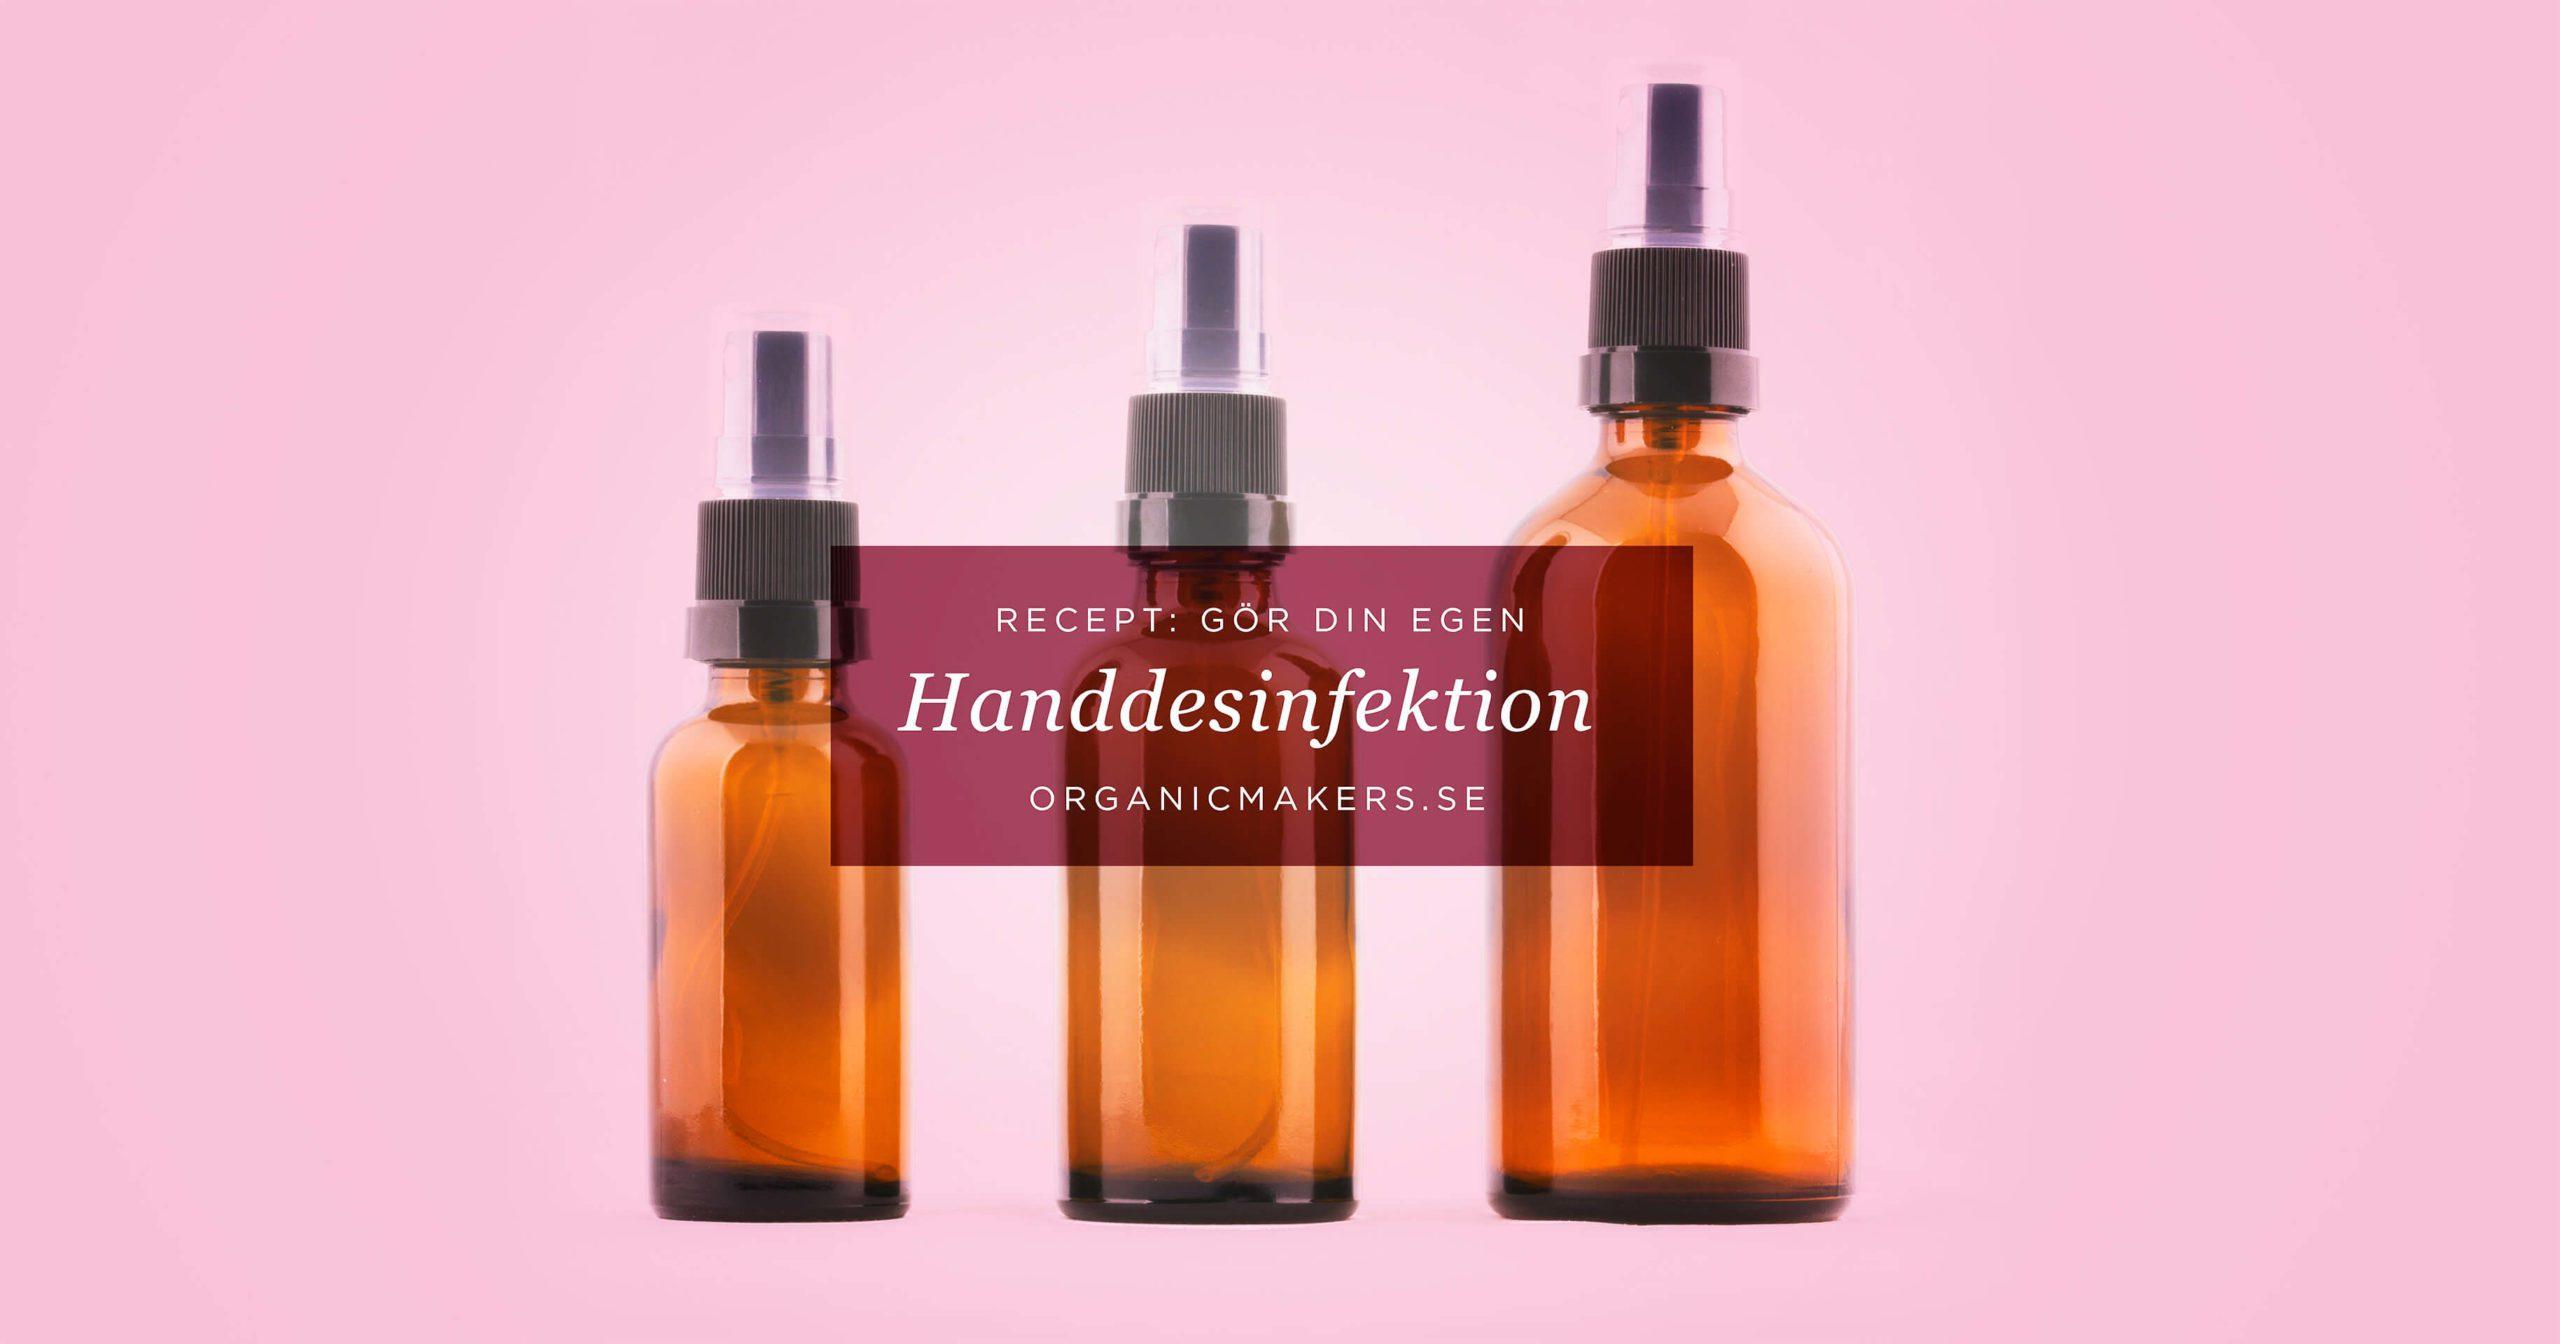 Gör egen handdesinfektion, handsprit, alcogel - organicmakers.se